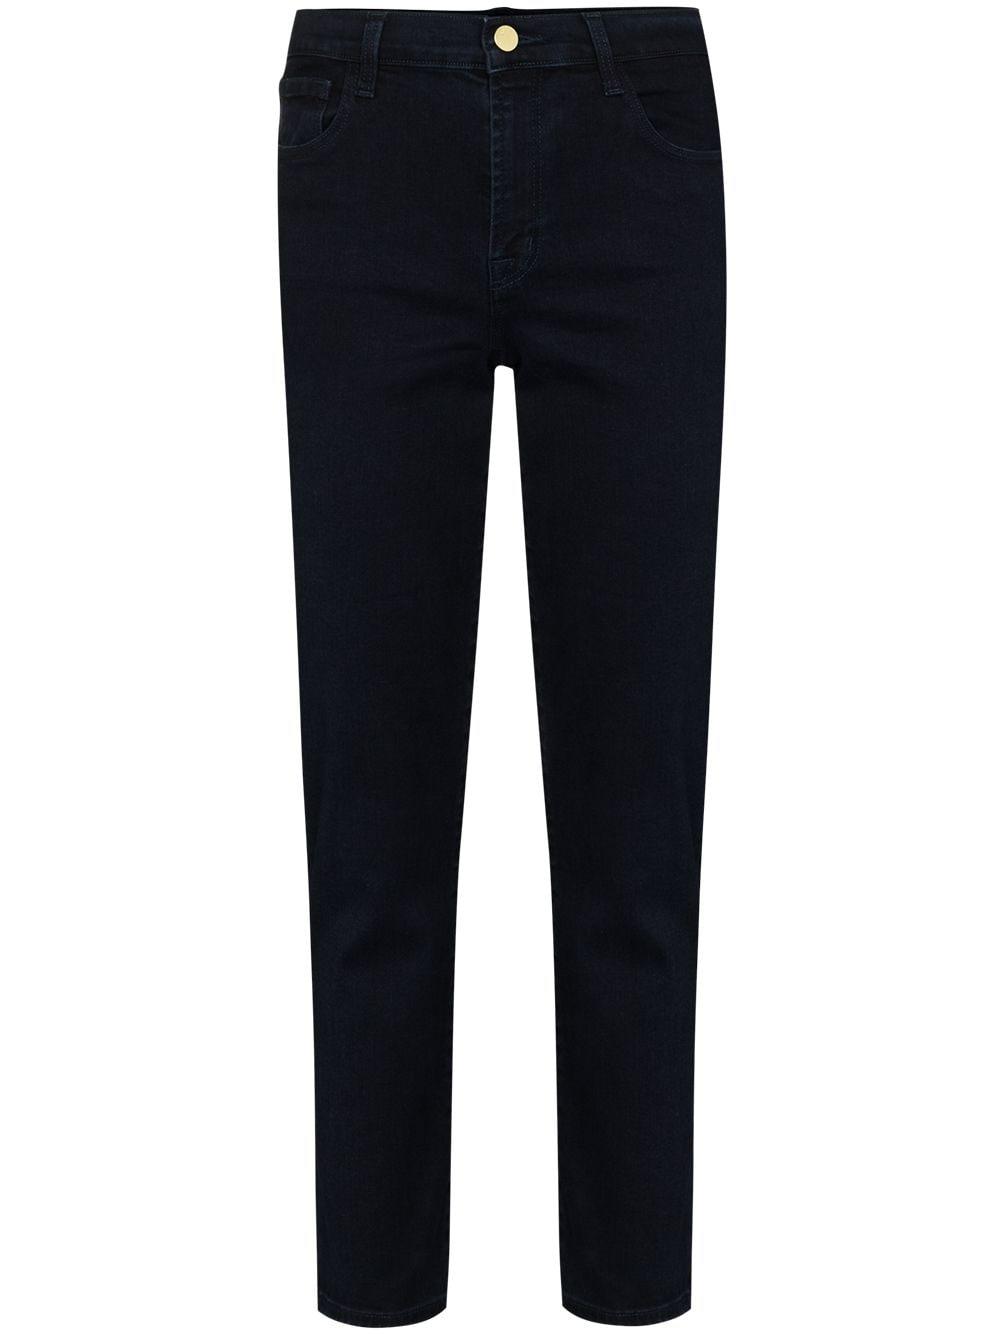 Adele Denim Jeans